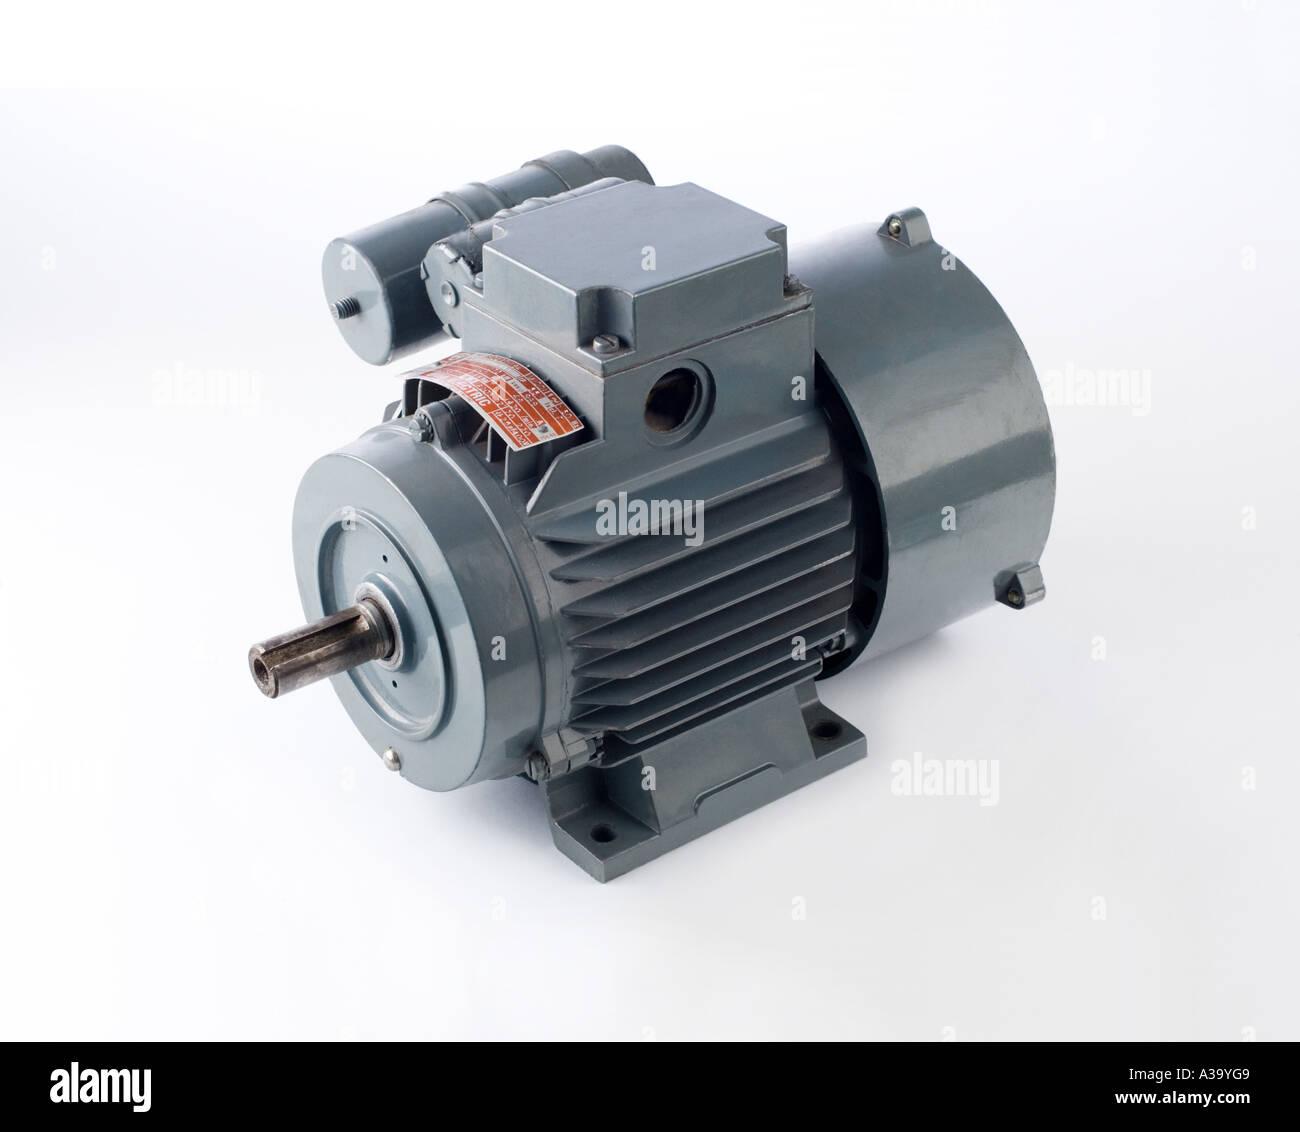 industrielle Elektromotor 1 hp Ac 1450 u/min Stockbild